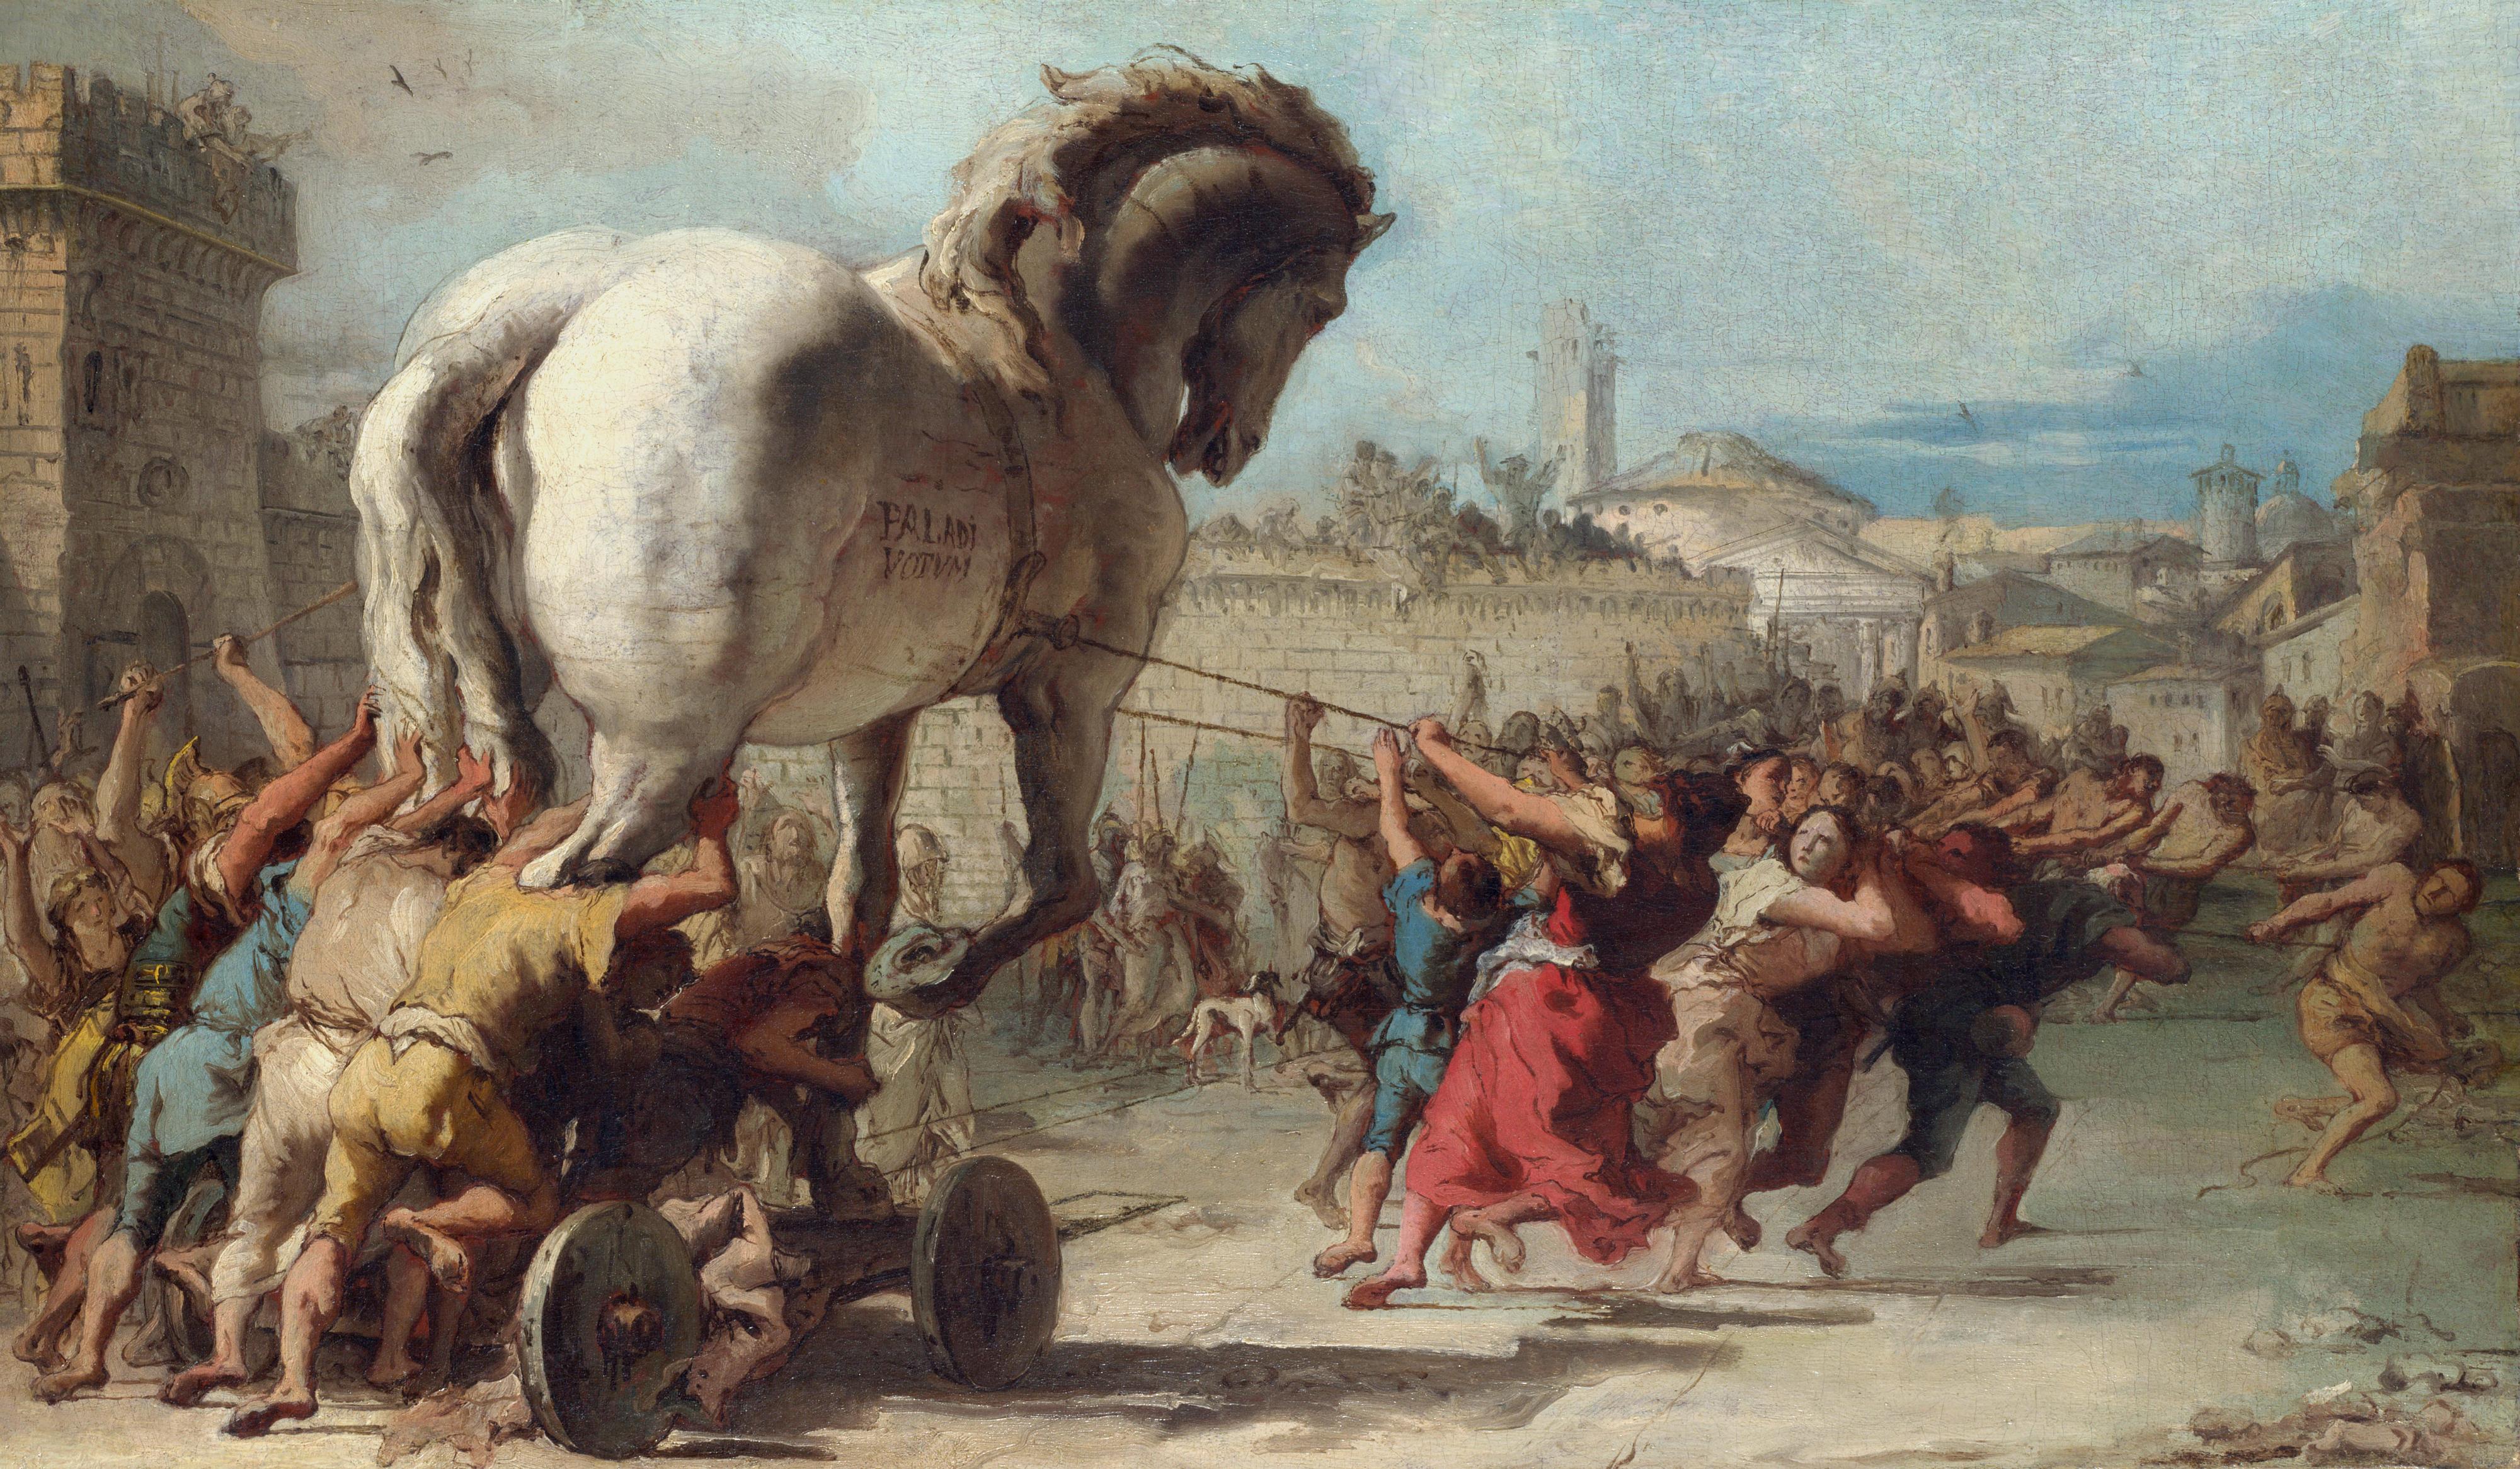 обои Шествие Троянского коня, картина, Джованни Доменико Тьеполо, Giandomenico Tiepolo картинки фото